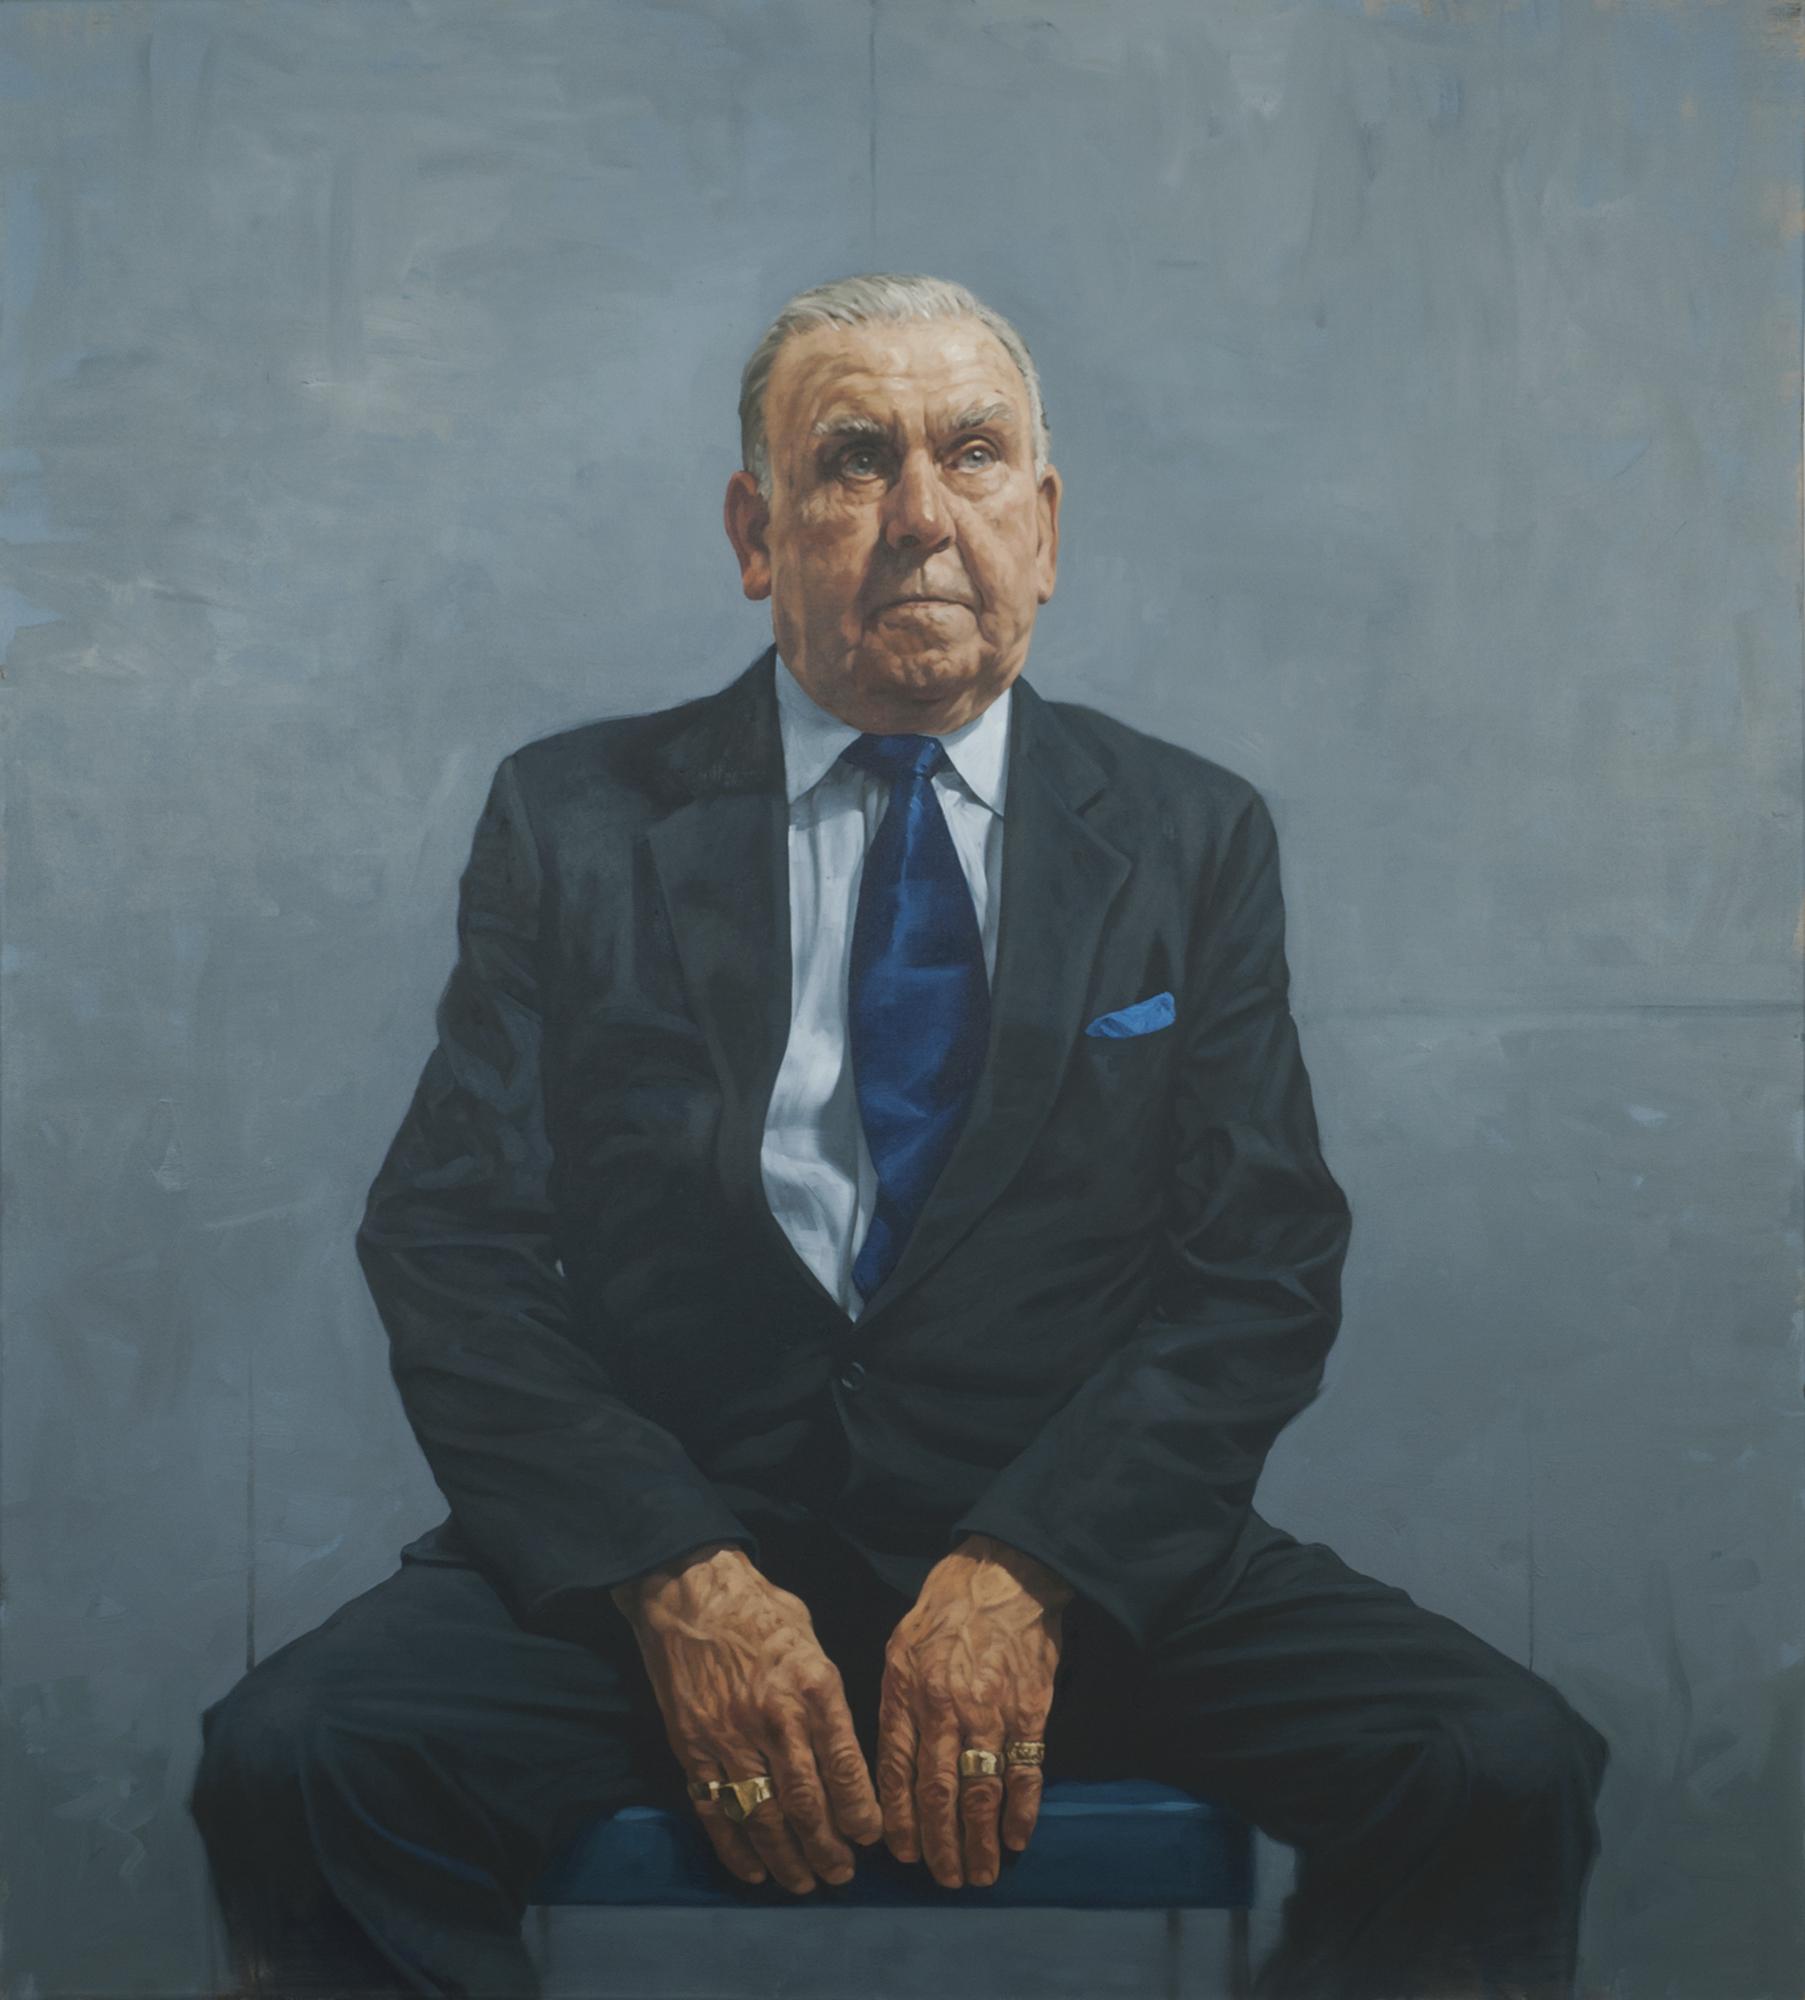 SPA 2017 Exhibition,Frank Curran (bantamweight)142 x 128 cm (framed)Oil £10,000